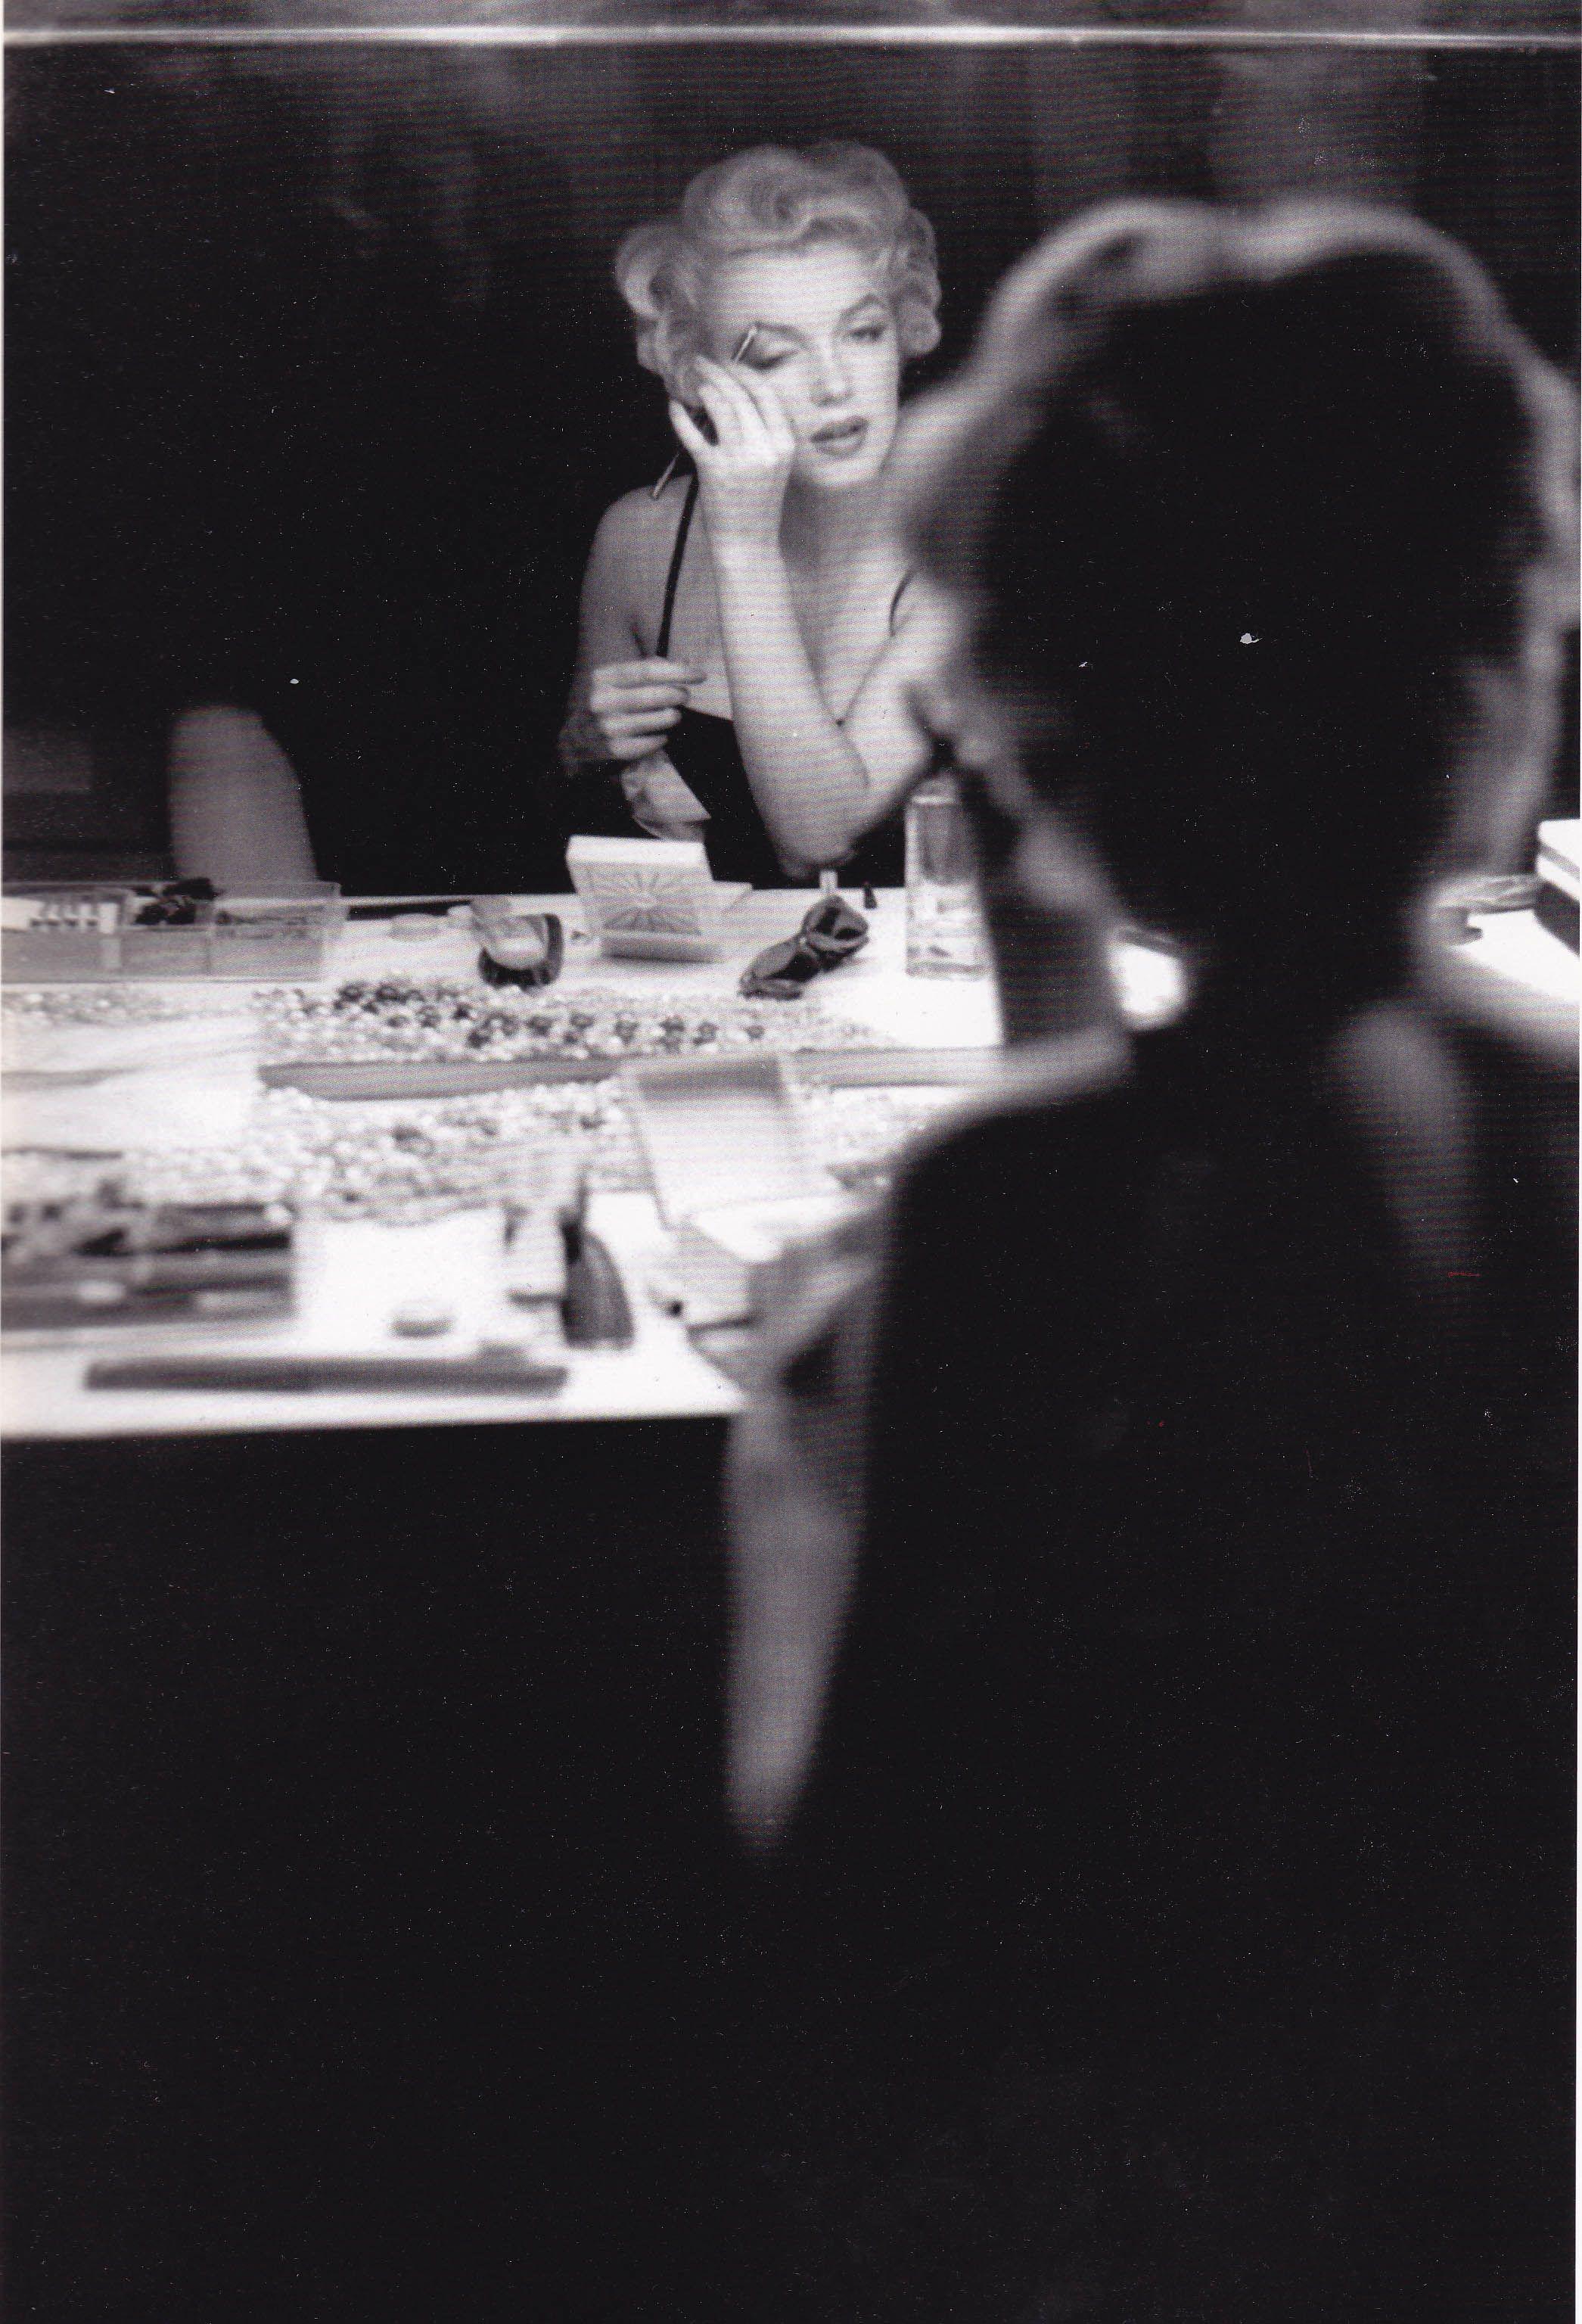 putting on make up | R U N D K A N T / Trapholt | Pinterest ...